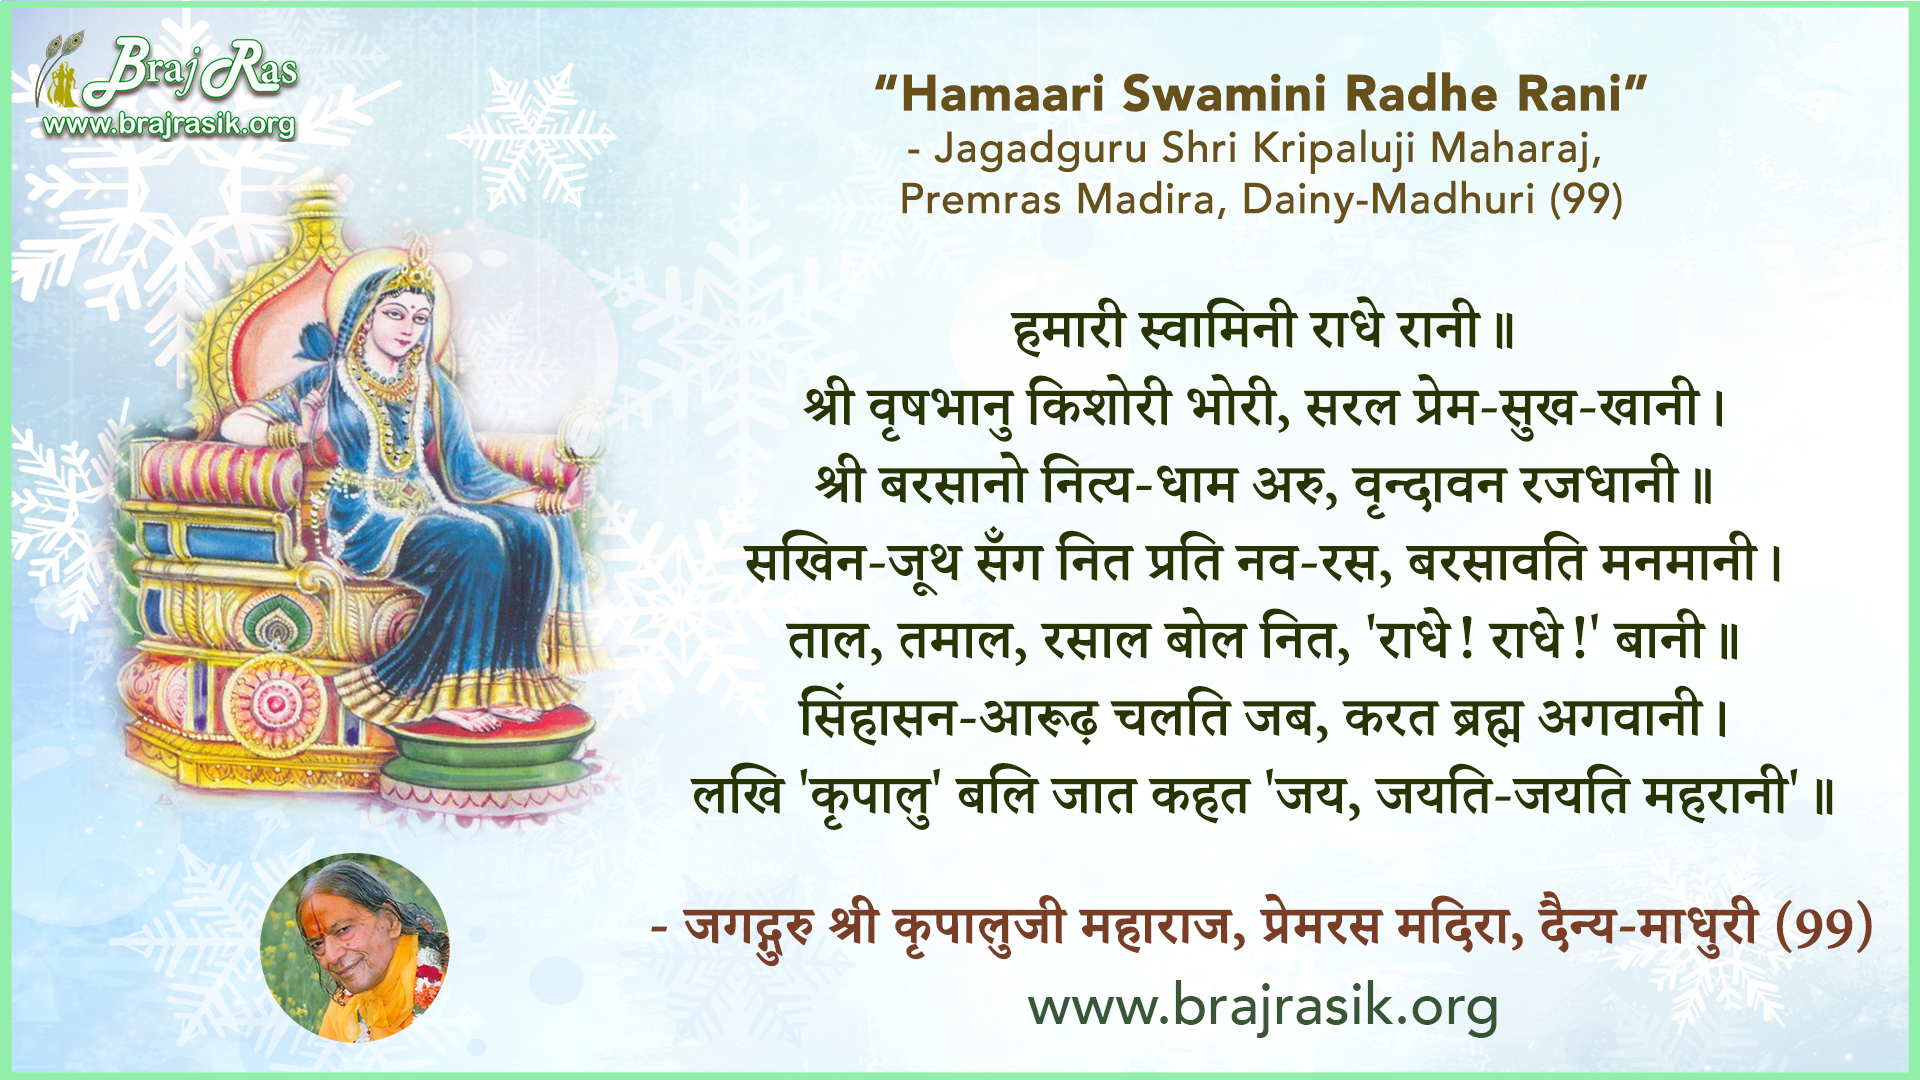 Hamaari Swamini Radhe Rani - Jagadguru Shri Kripaluji Maharaj, Premras Madira, Dainy-Madhuri (99)